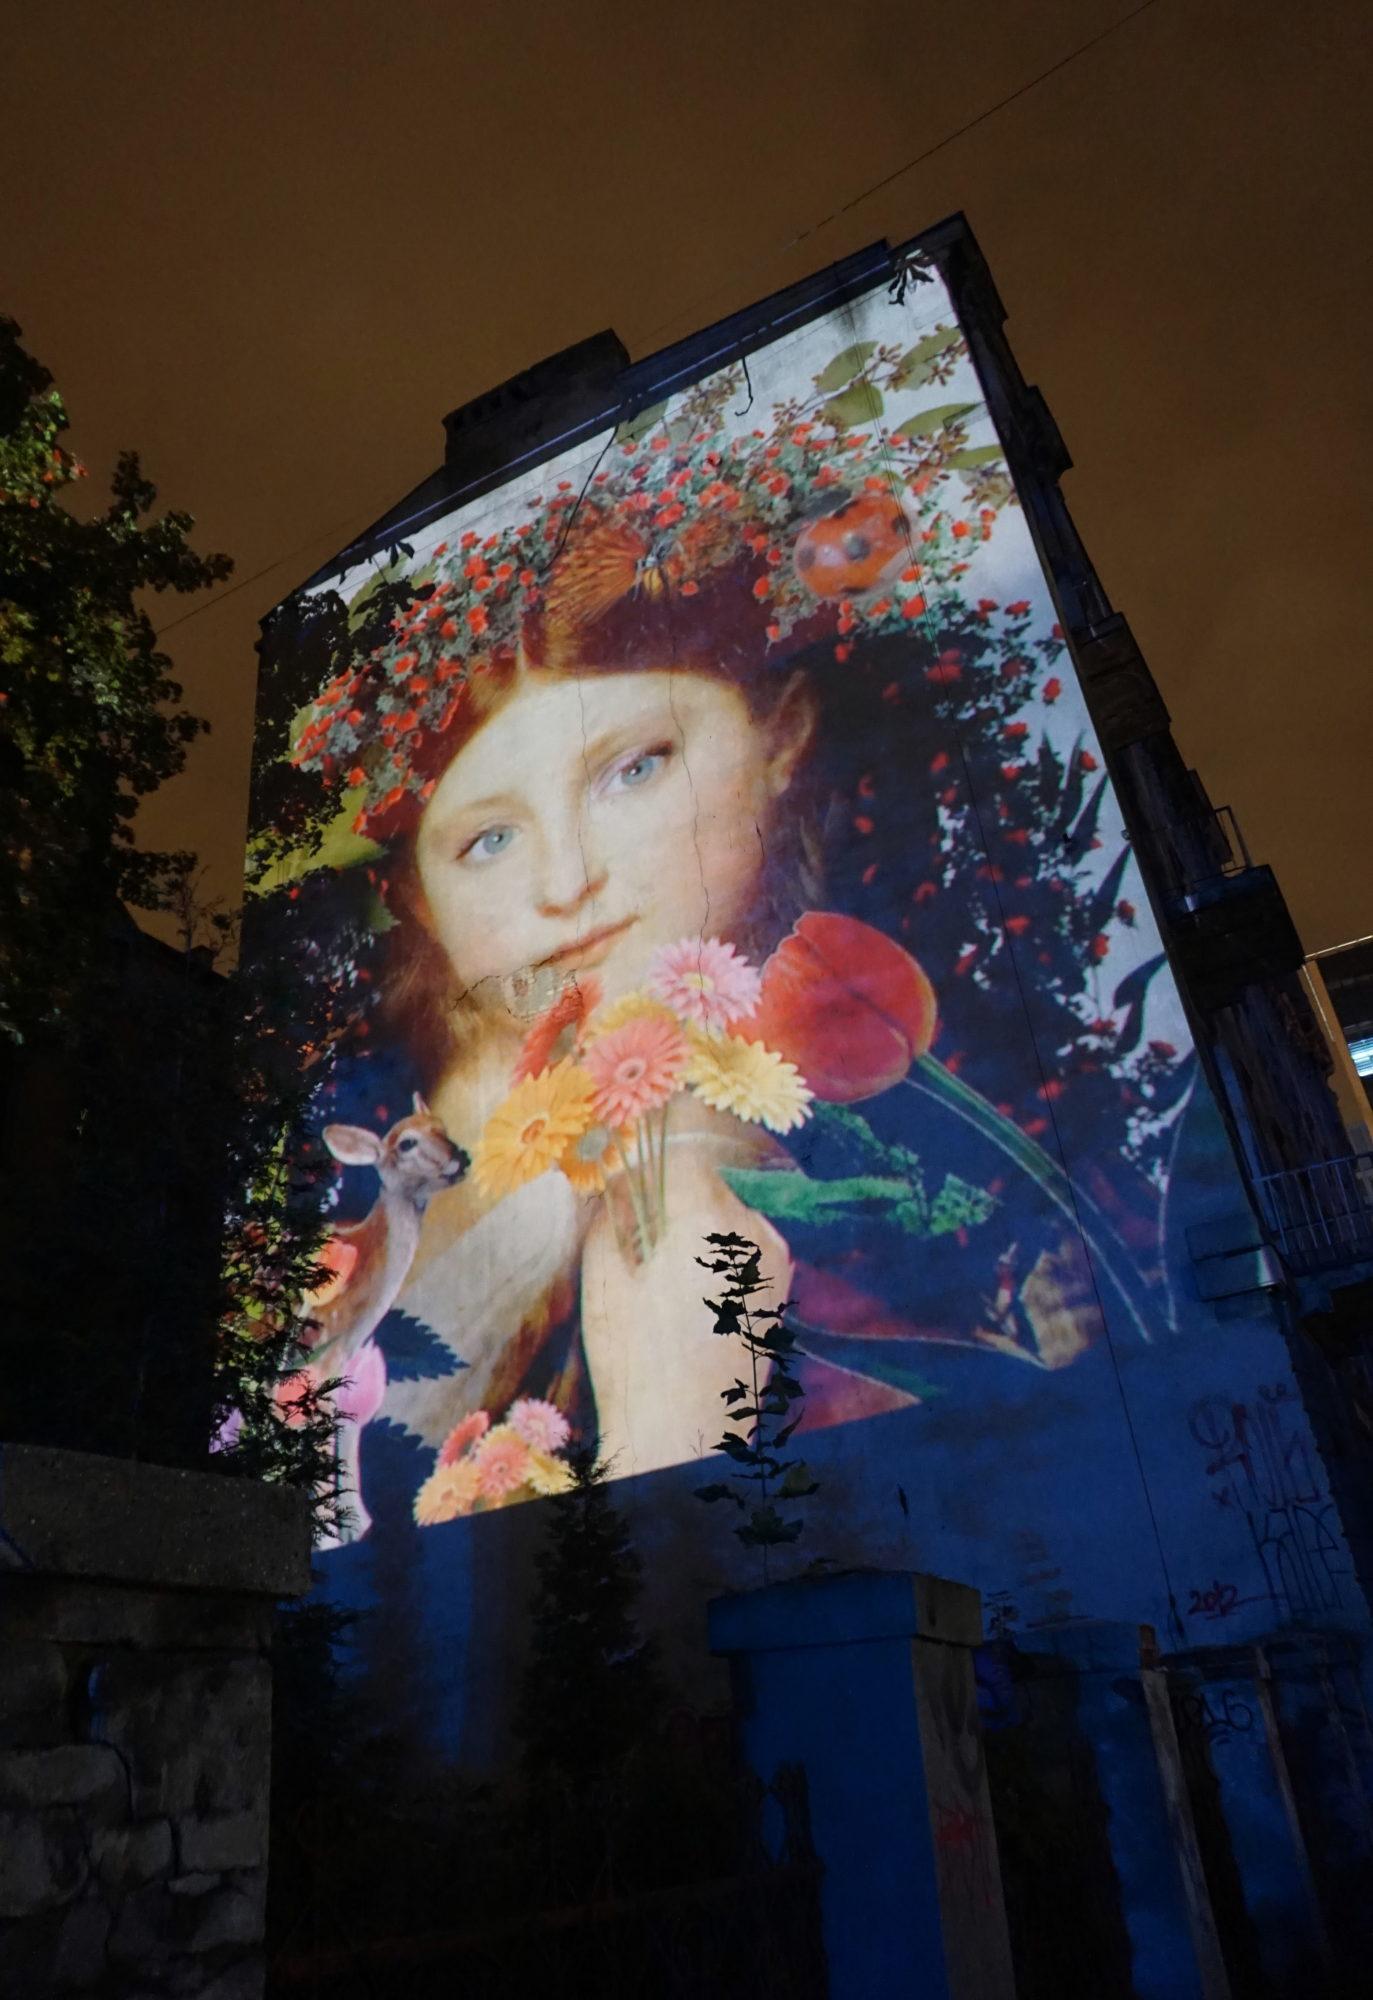 Festiwal Światła Łódź